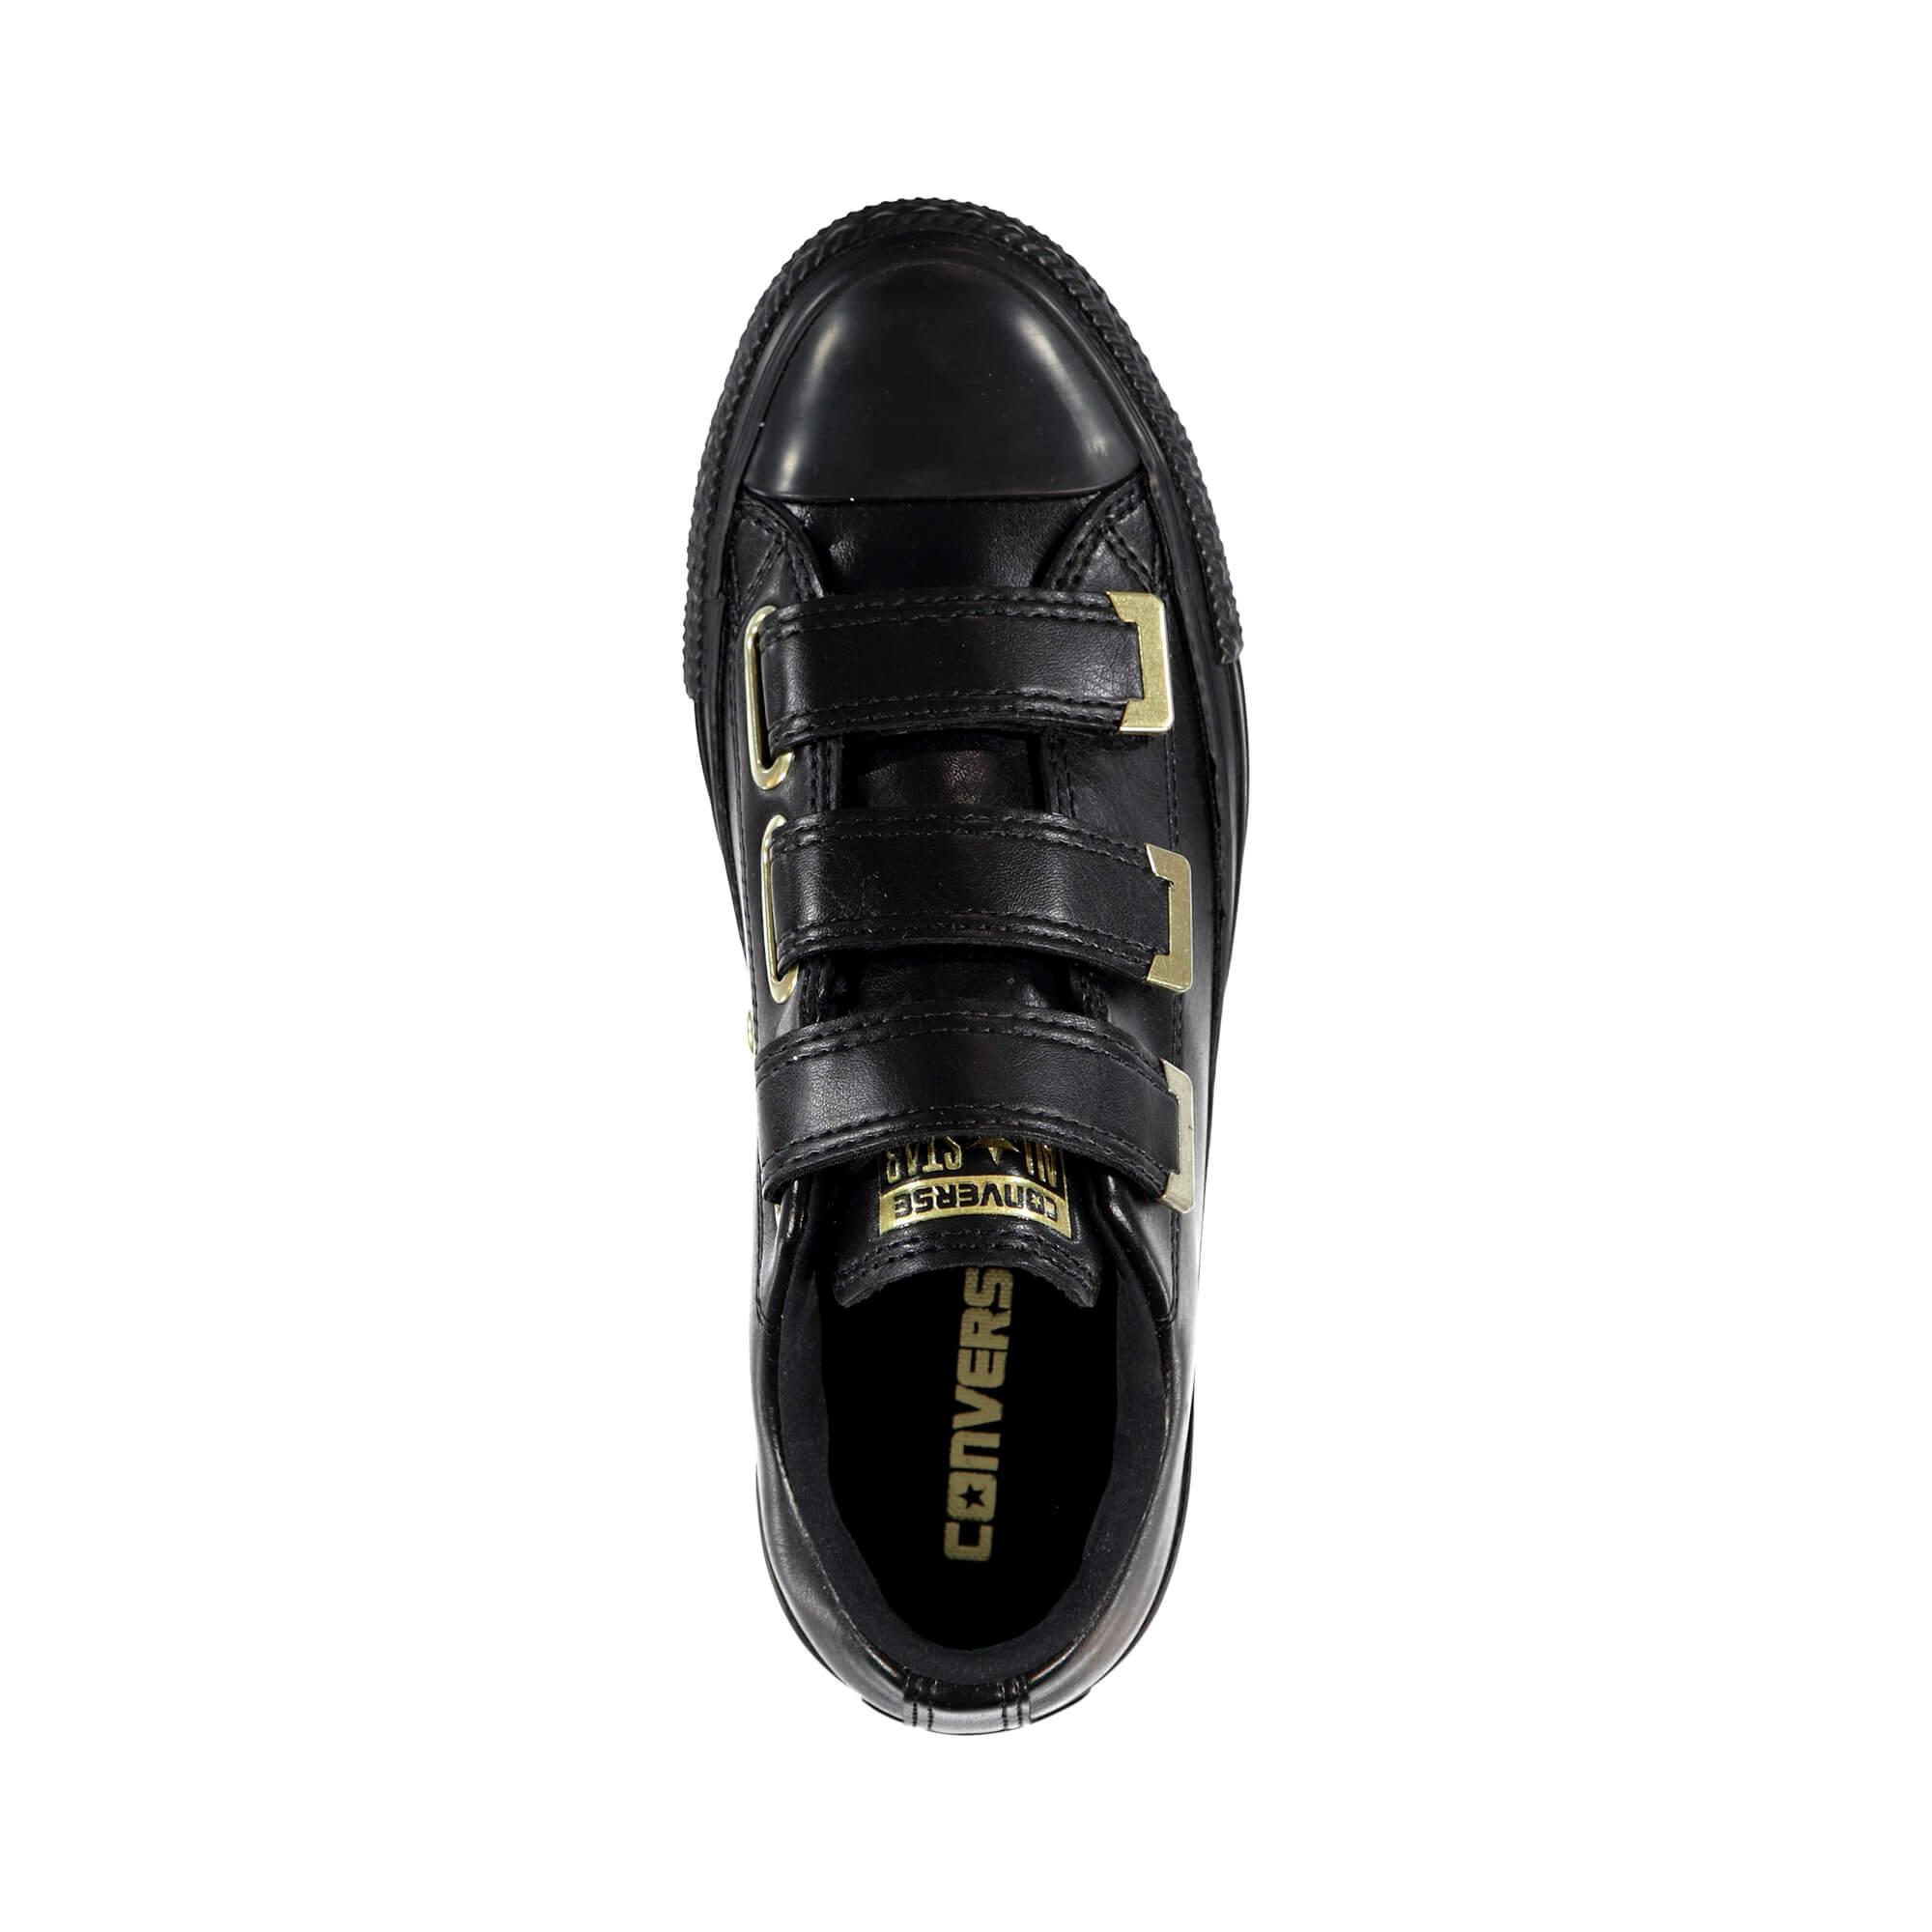 Converse Chuck Taylor All Star 3V Kadın Siyah Sneaker